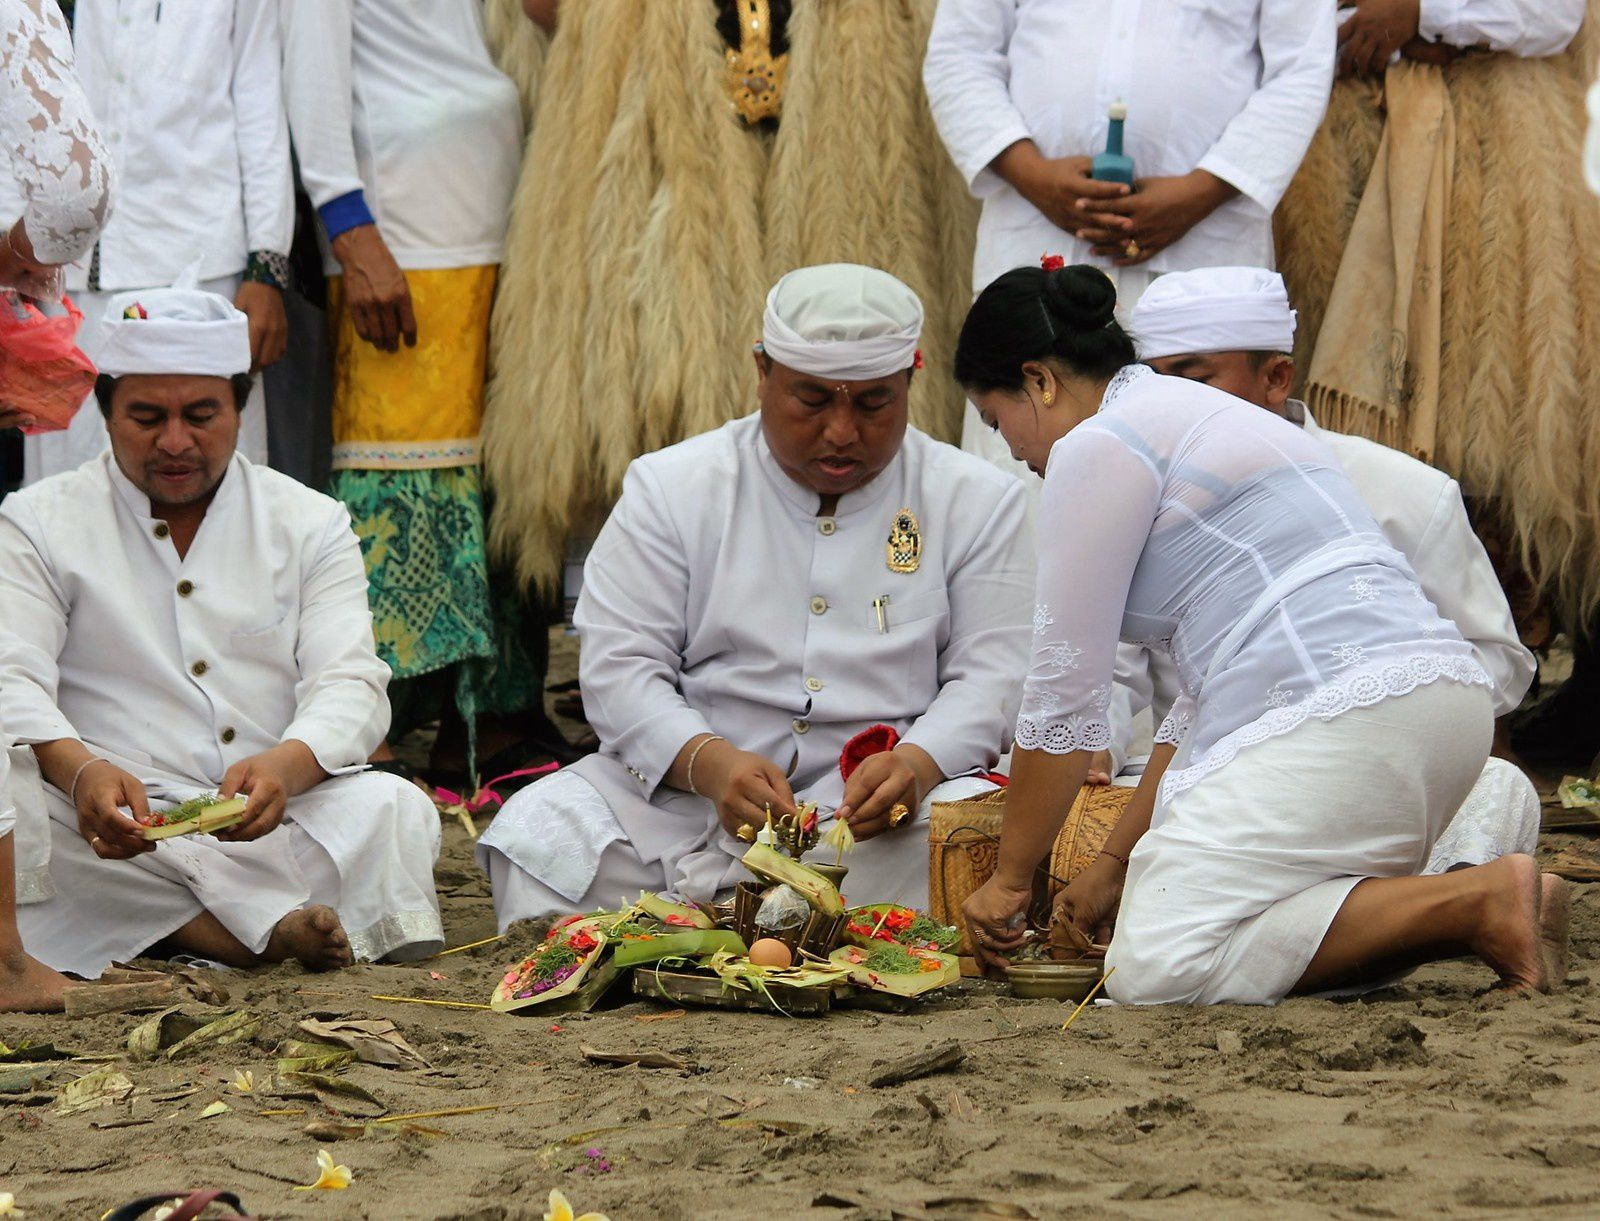 Seminyak. Melasti sur la plage. Ceremonie.